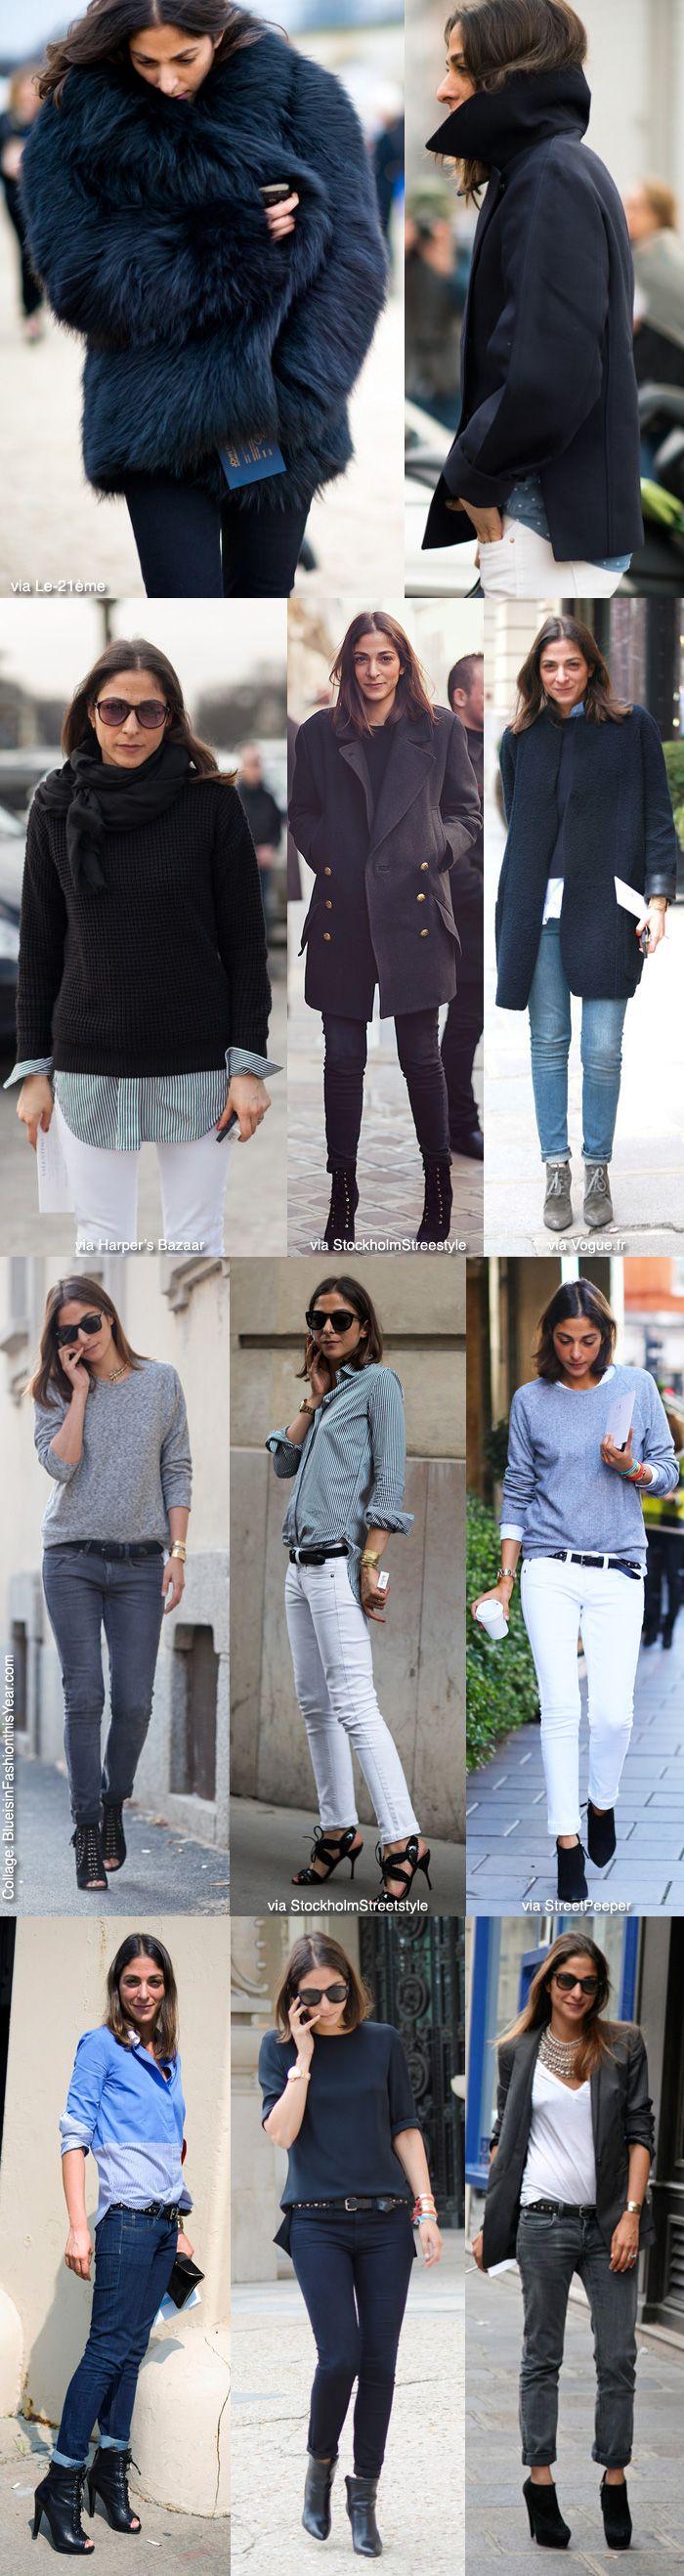 style with Capucine Safyurtlu Fashion & Market Editor of Vogue Paris.